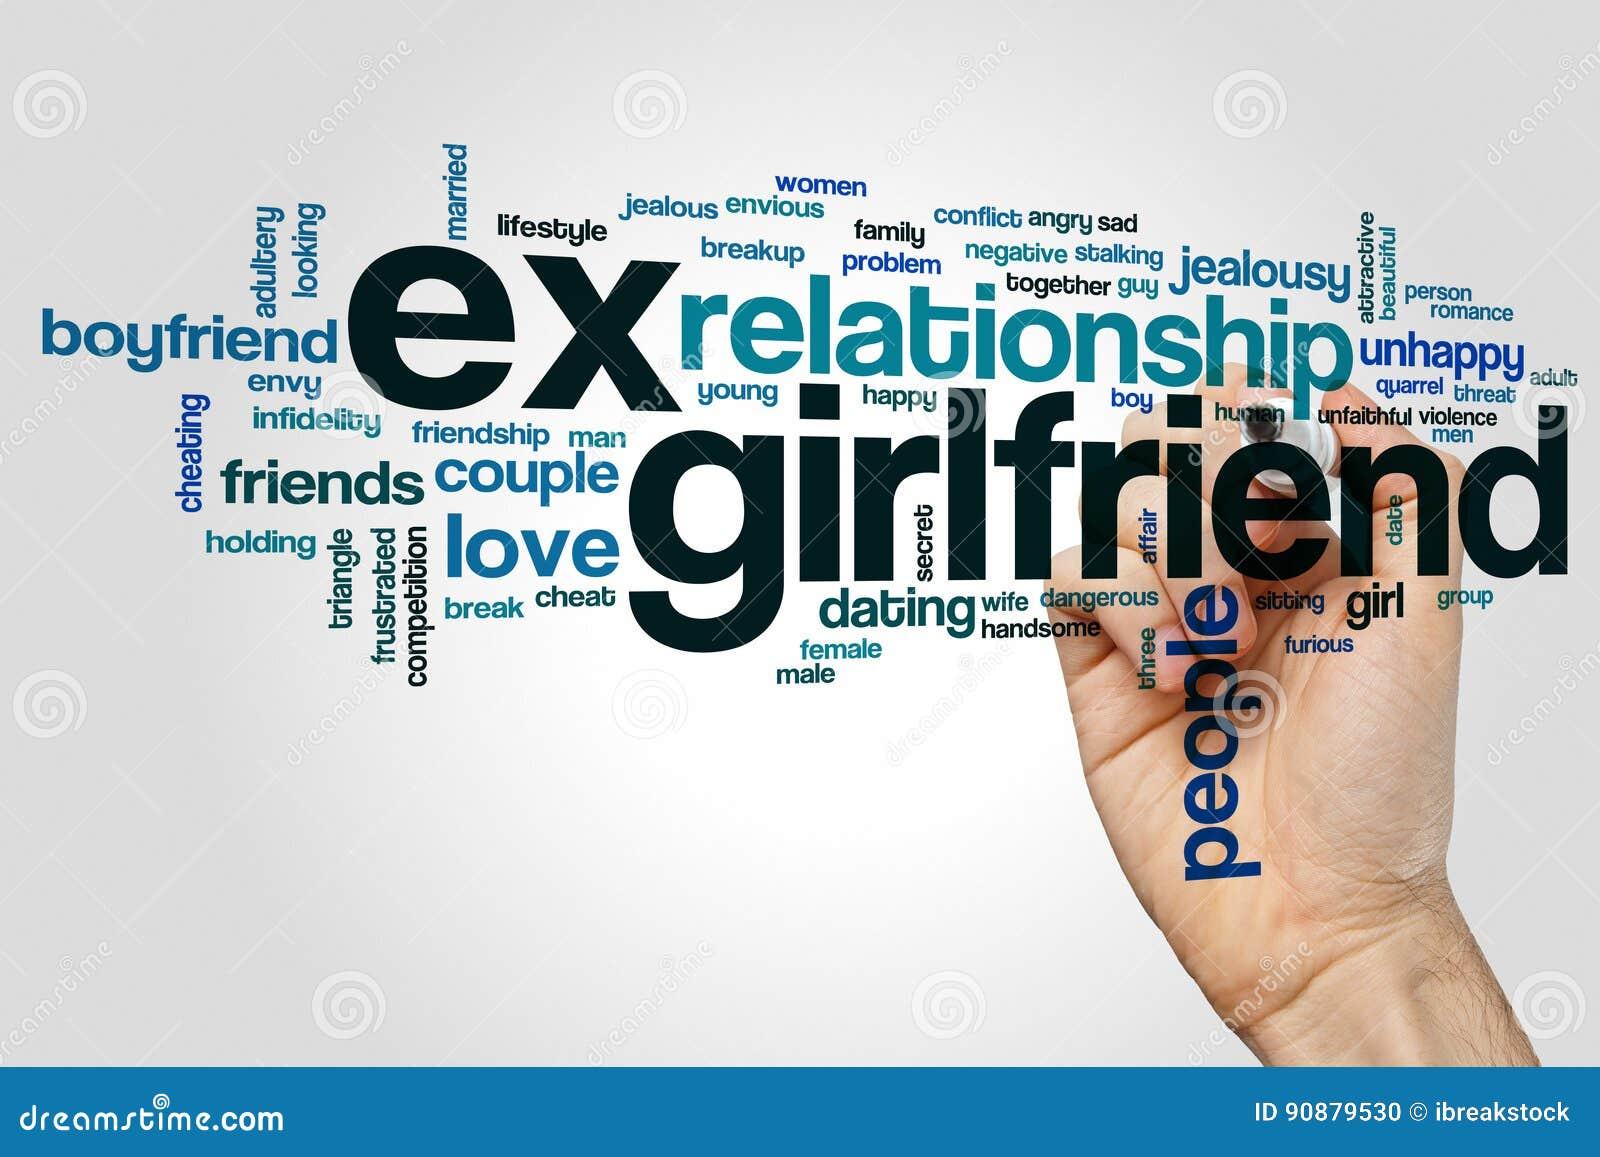 Dating σε απευθείας σύνδεση ηττημένους βοήθεια για τη δημιουργία ενός διαδικτυακού προφίλ γνωριμιών